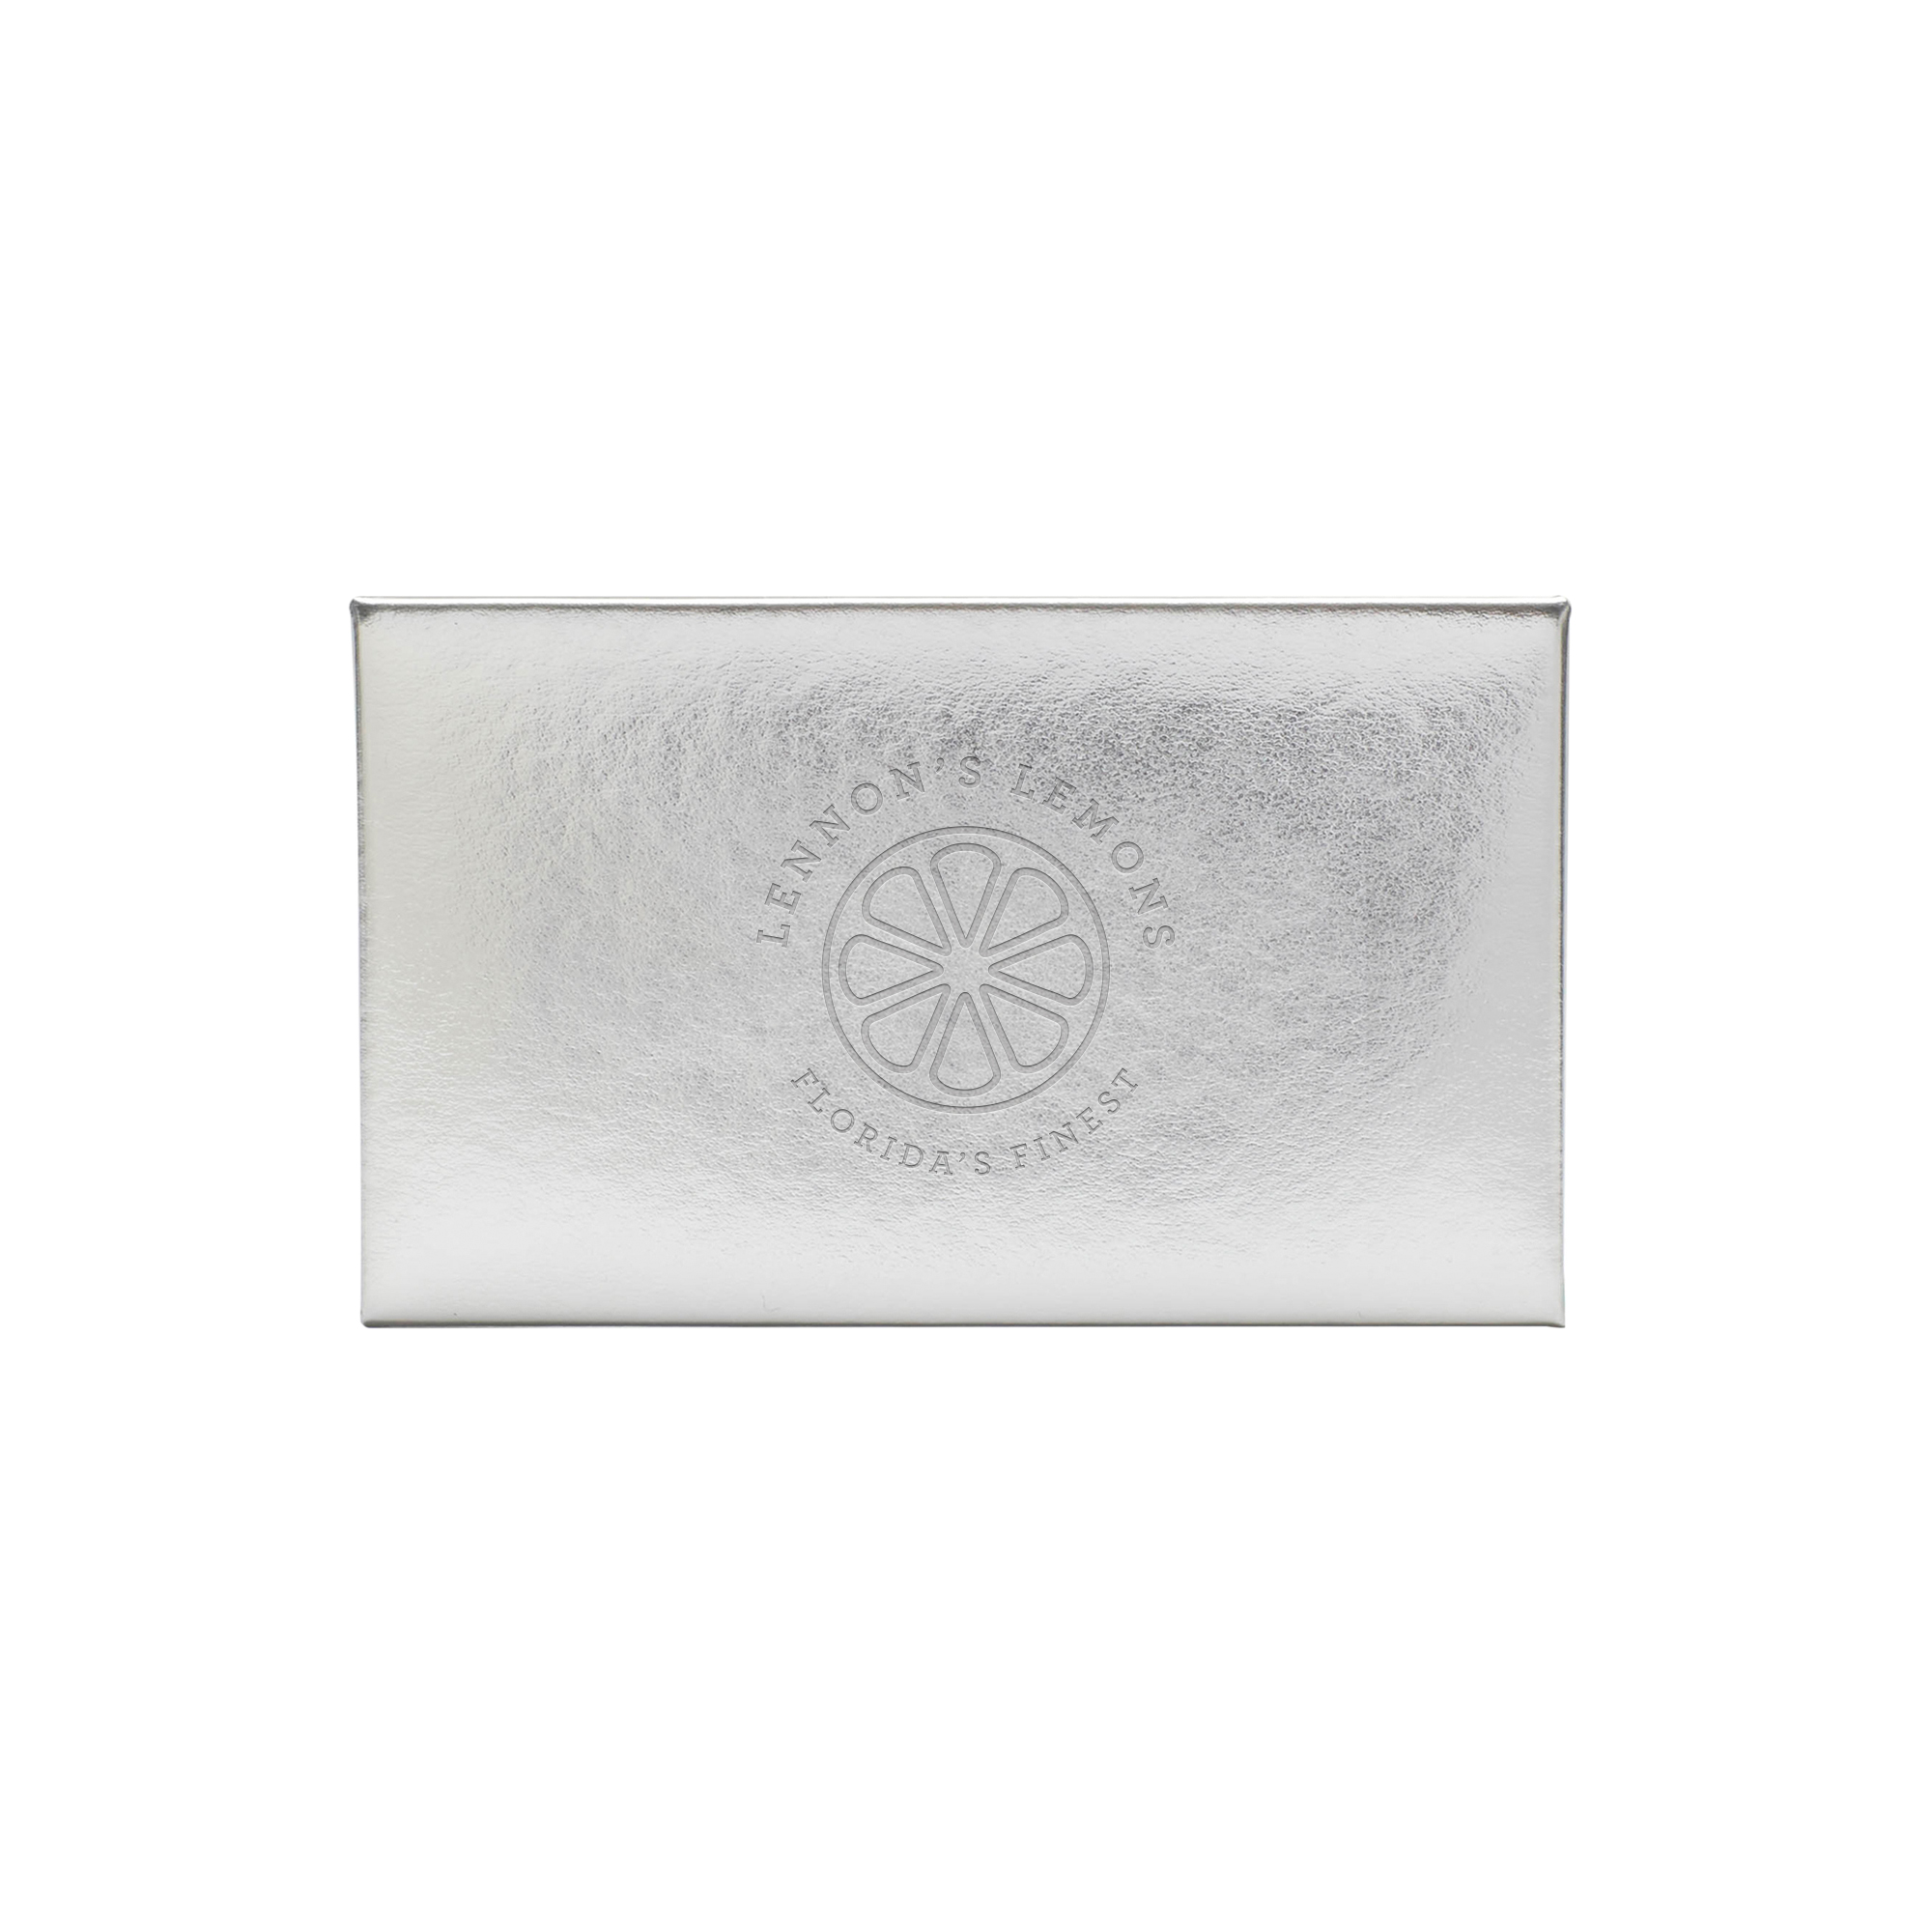 Custom Silver Card Case | Desk Accessories & Organization | Poppin